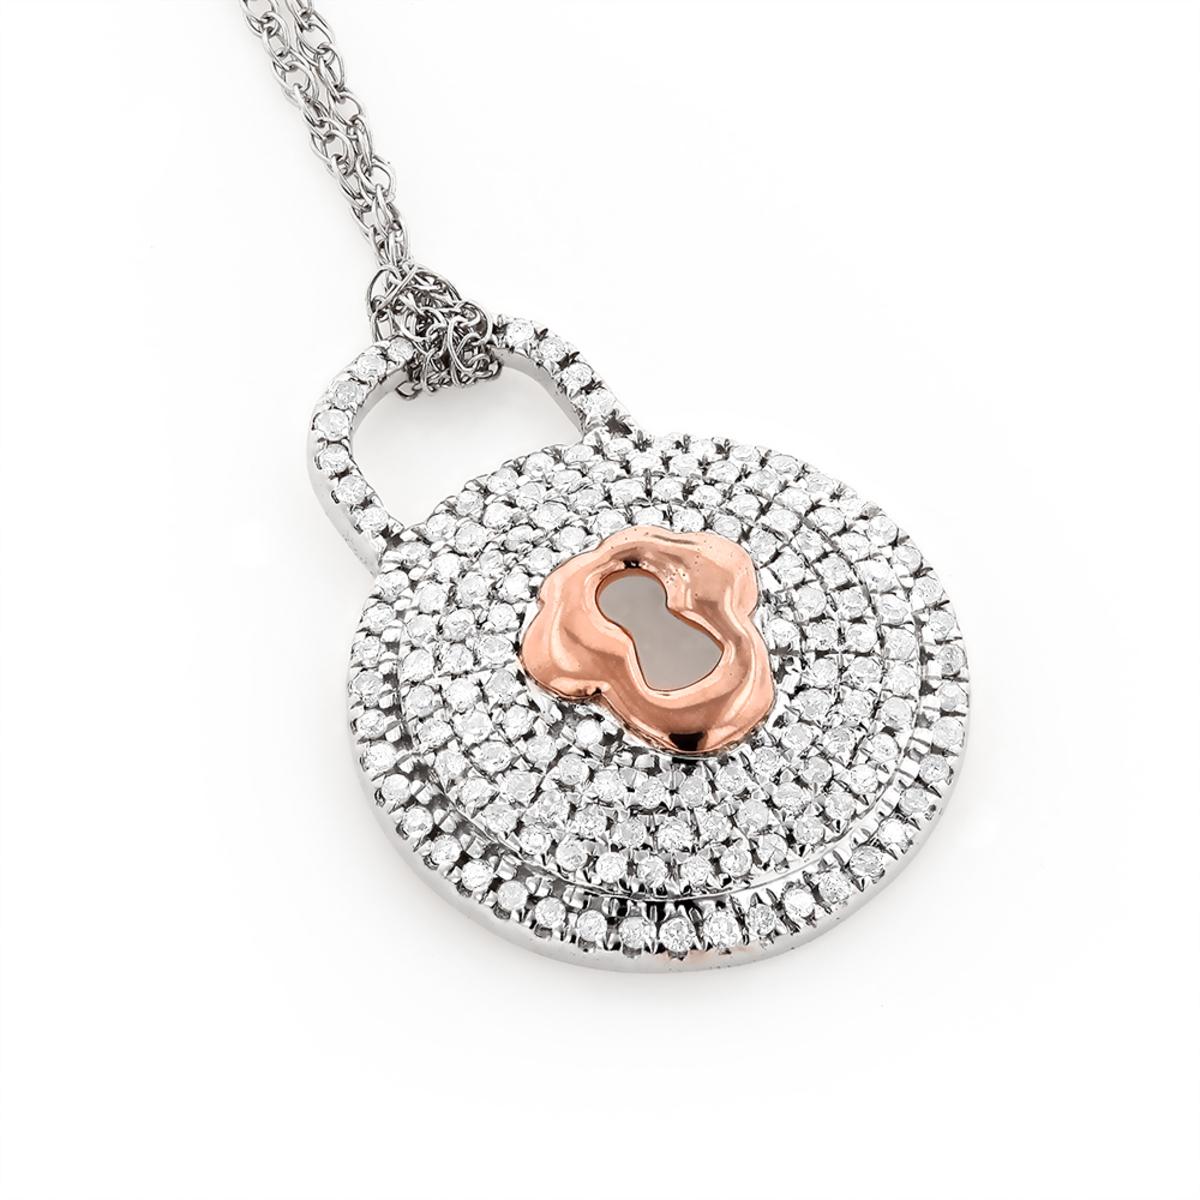 Gold Diamond Lock Pendant Necklace For Women 0.30ct 10K